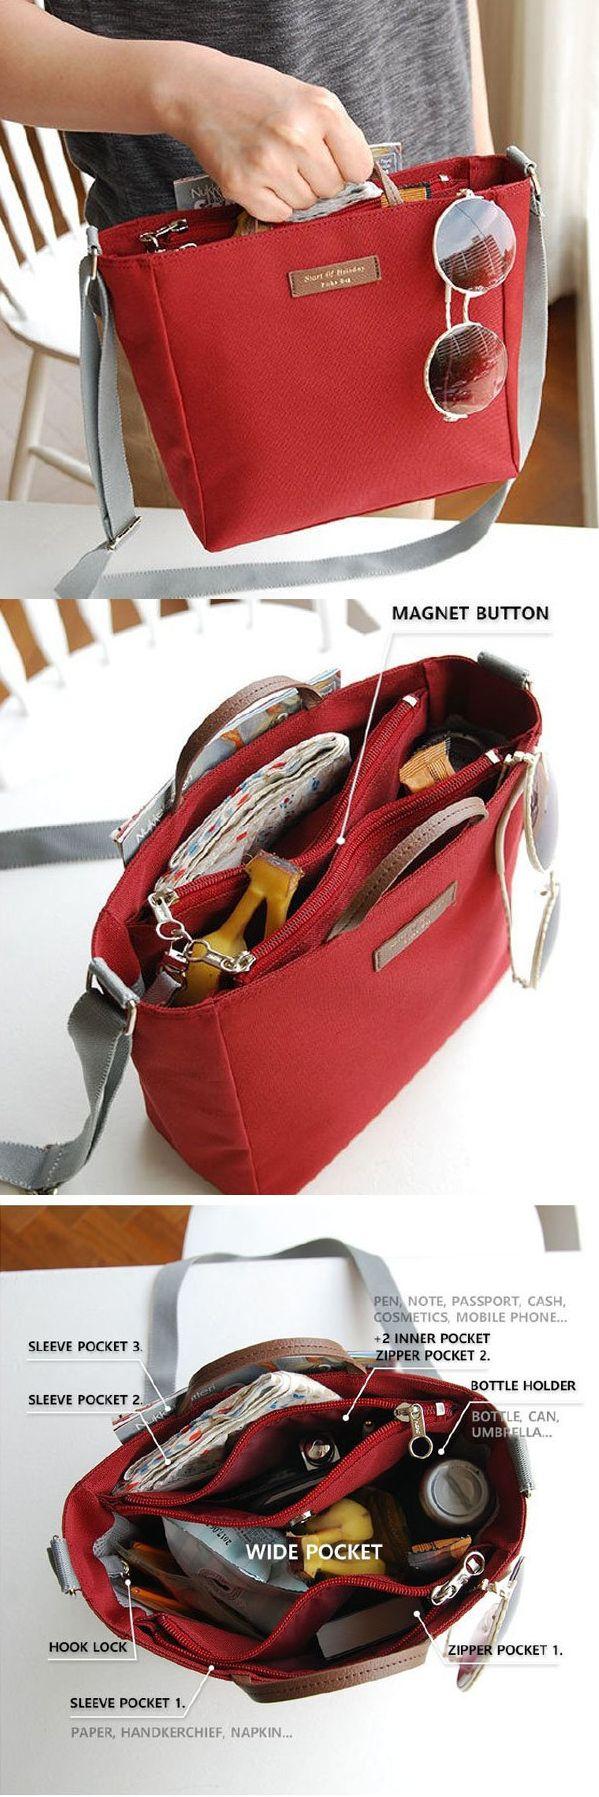 US$11.39 Multifunctional Waterproof Oxford Cloth Lightweight Outdoor Travel Handbag Shoulder Bag Storage Bag